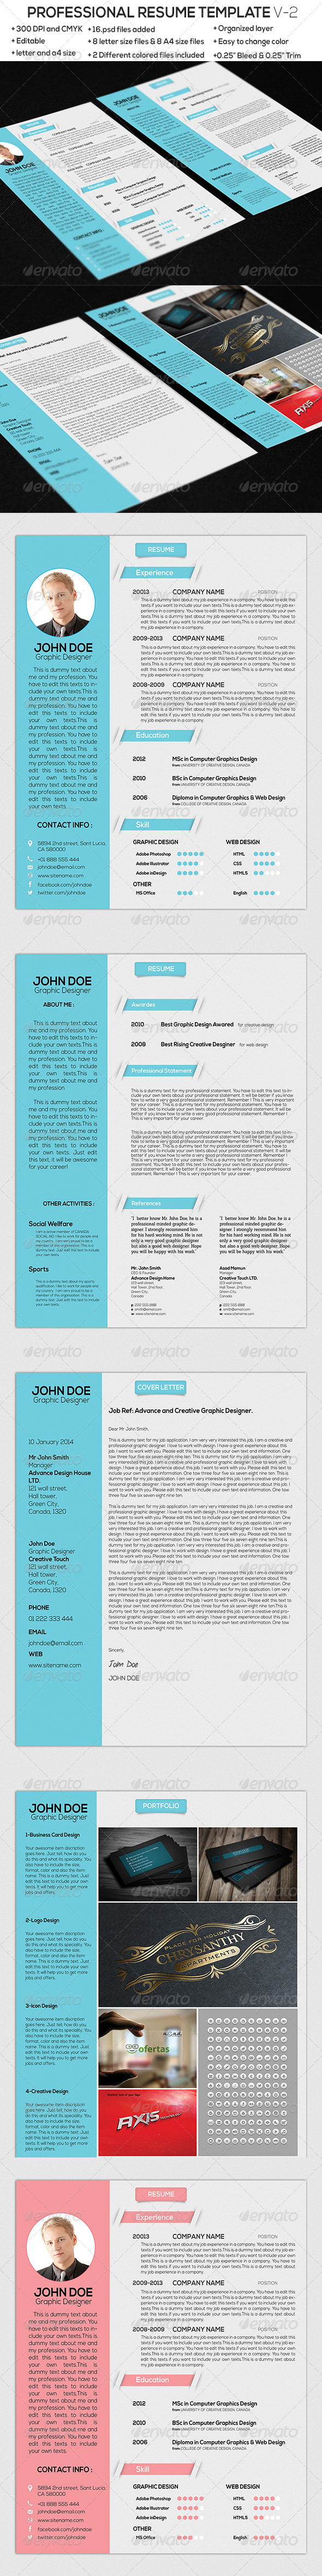 GraphicRiver Professional Resume Template V-2 6789587